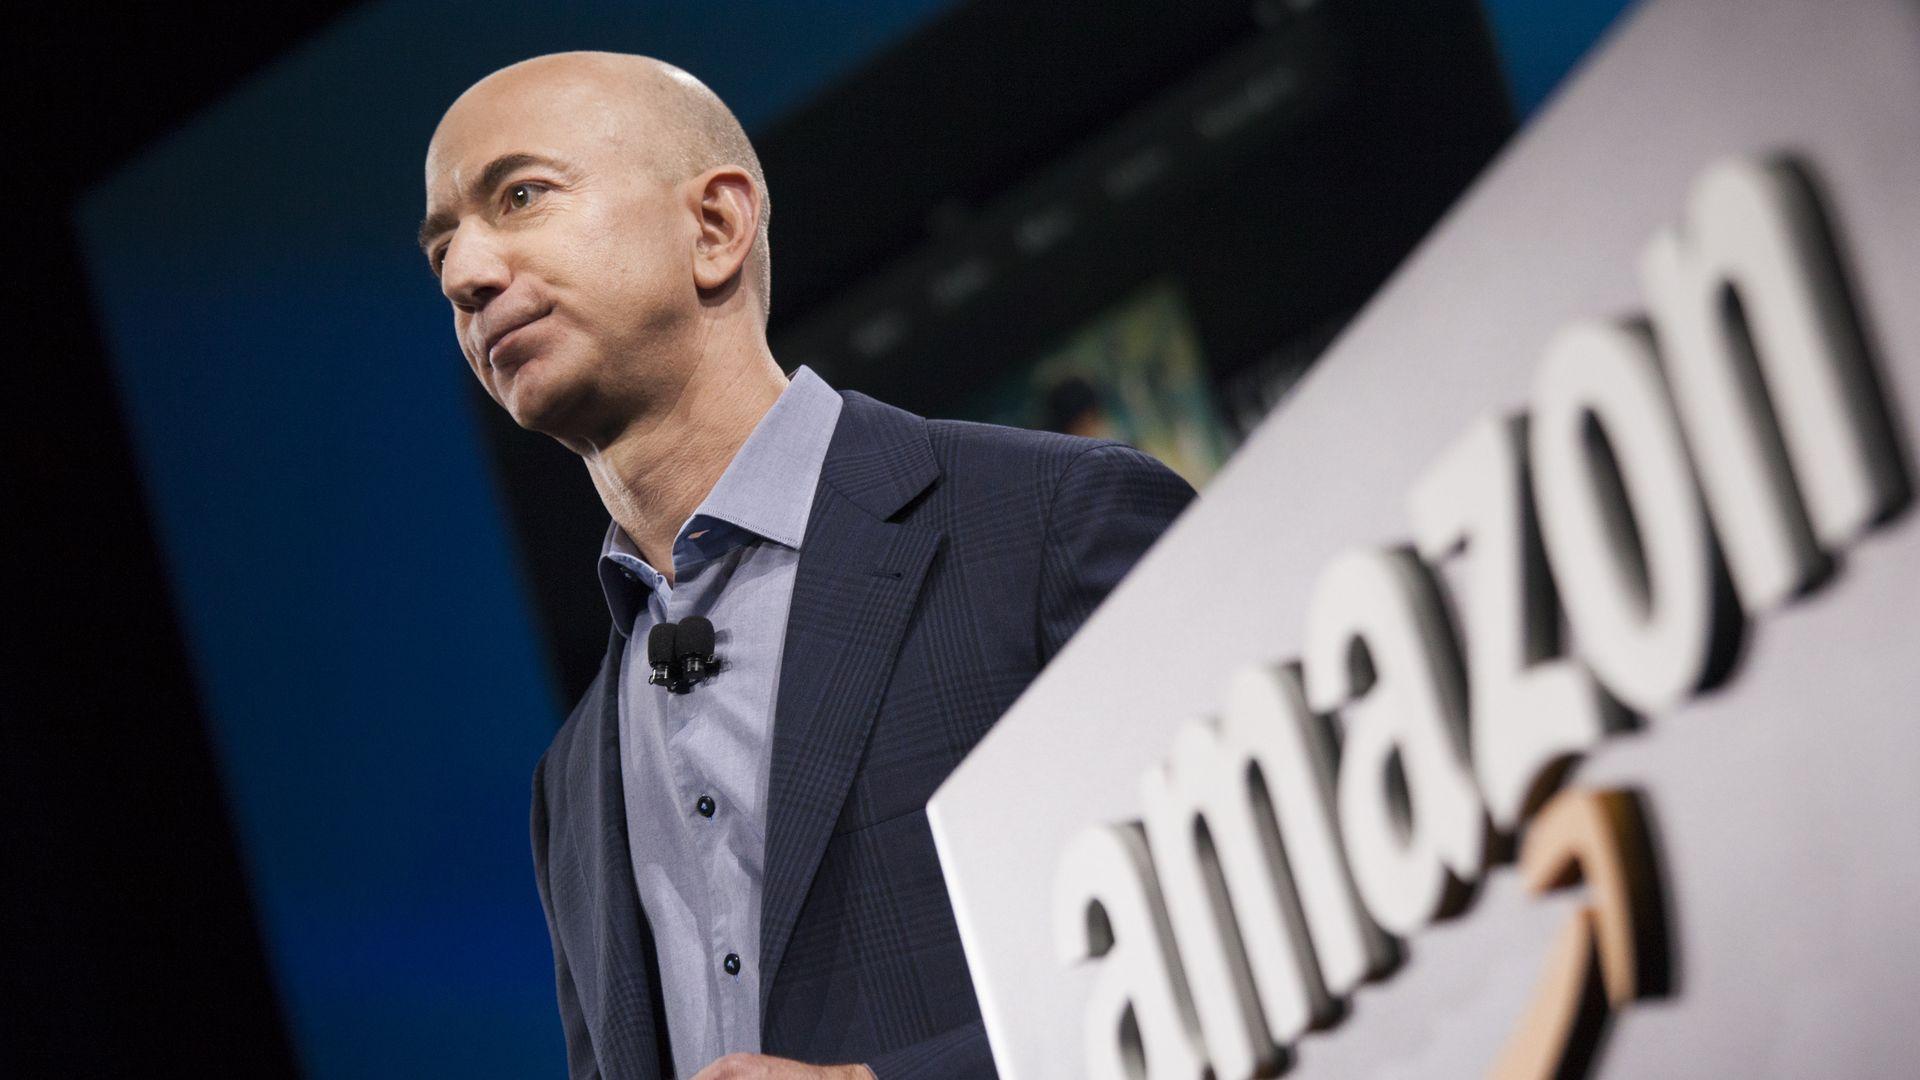 Jeff Bezos in front of an Amazon logo